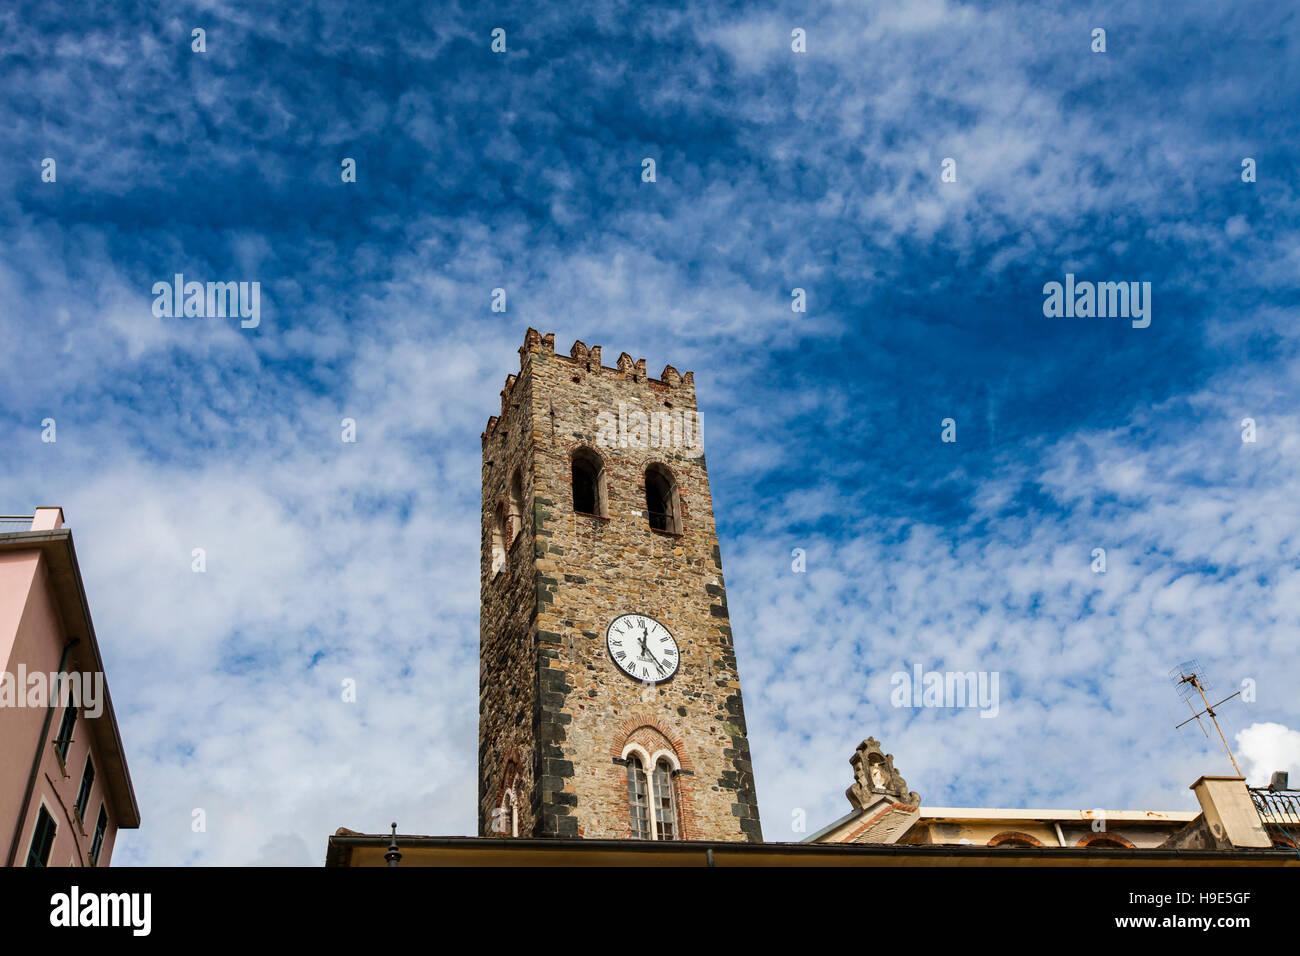 Glockenturm der Pfarrkirche Kirche San Giovanni Battista in Monterosso, Italien Stockfoto